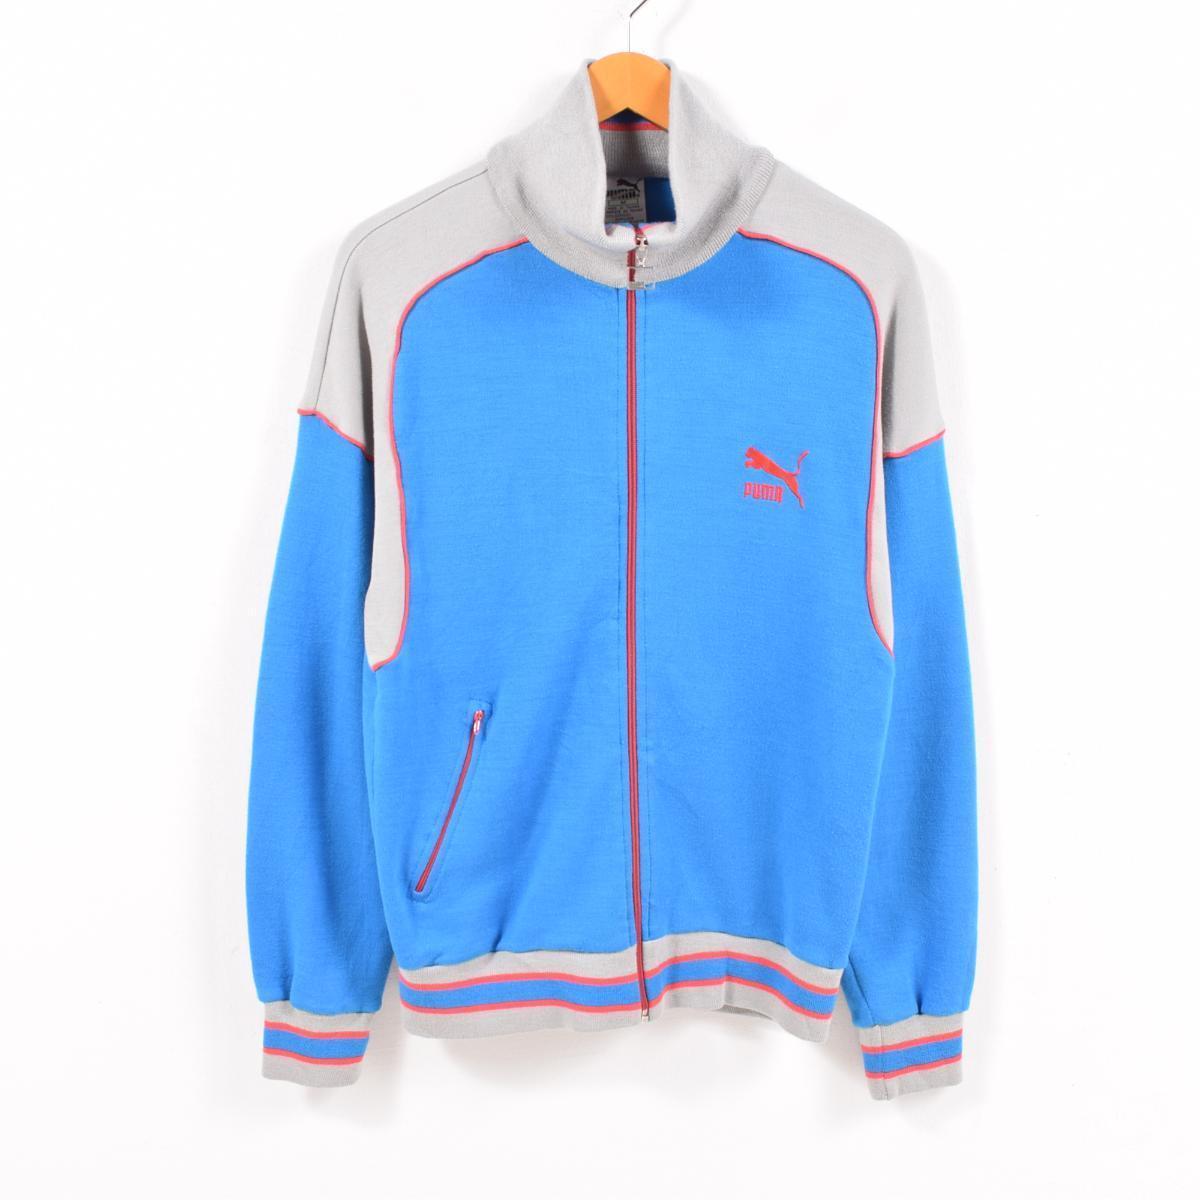 83b6fb654 80s Puma PUMA acrylic jersey truck jacket men M vintage /wbc6390